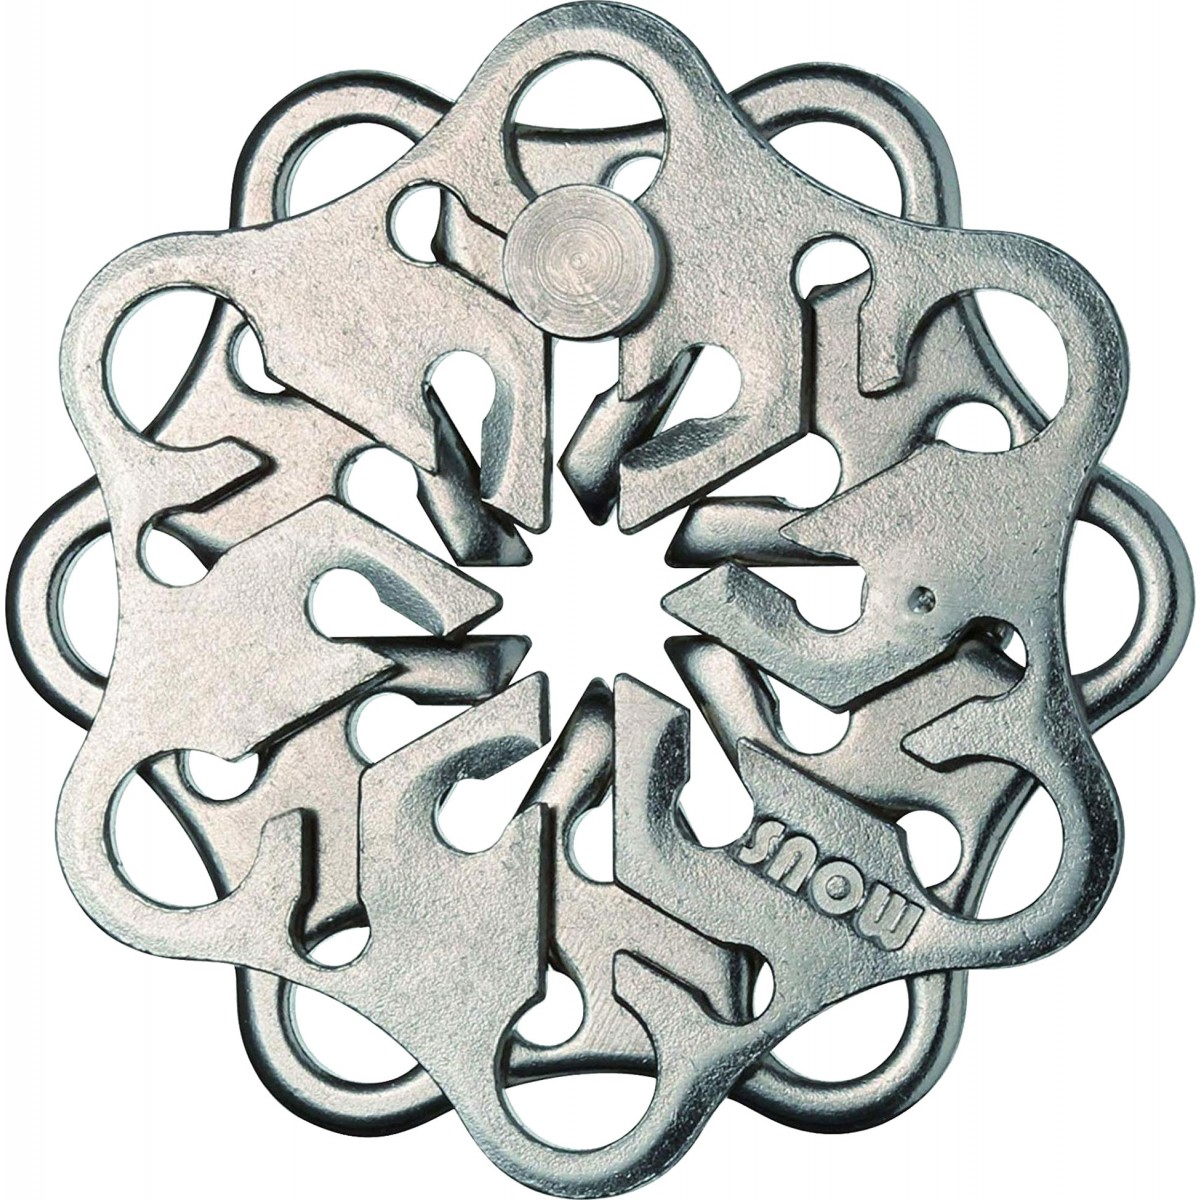 Puzzle mecanic - Huzzle Cast Snow | Logica Giochi